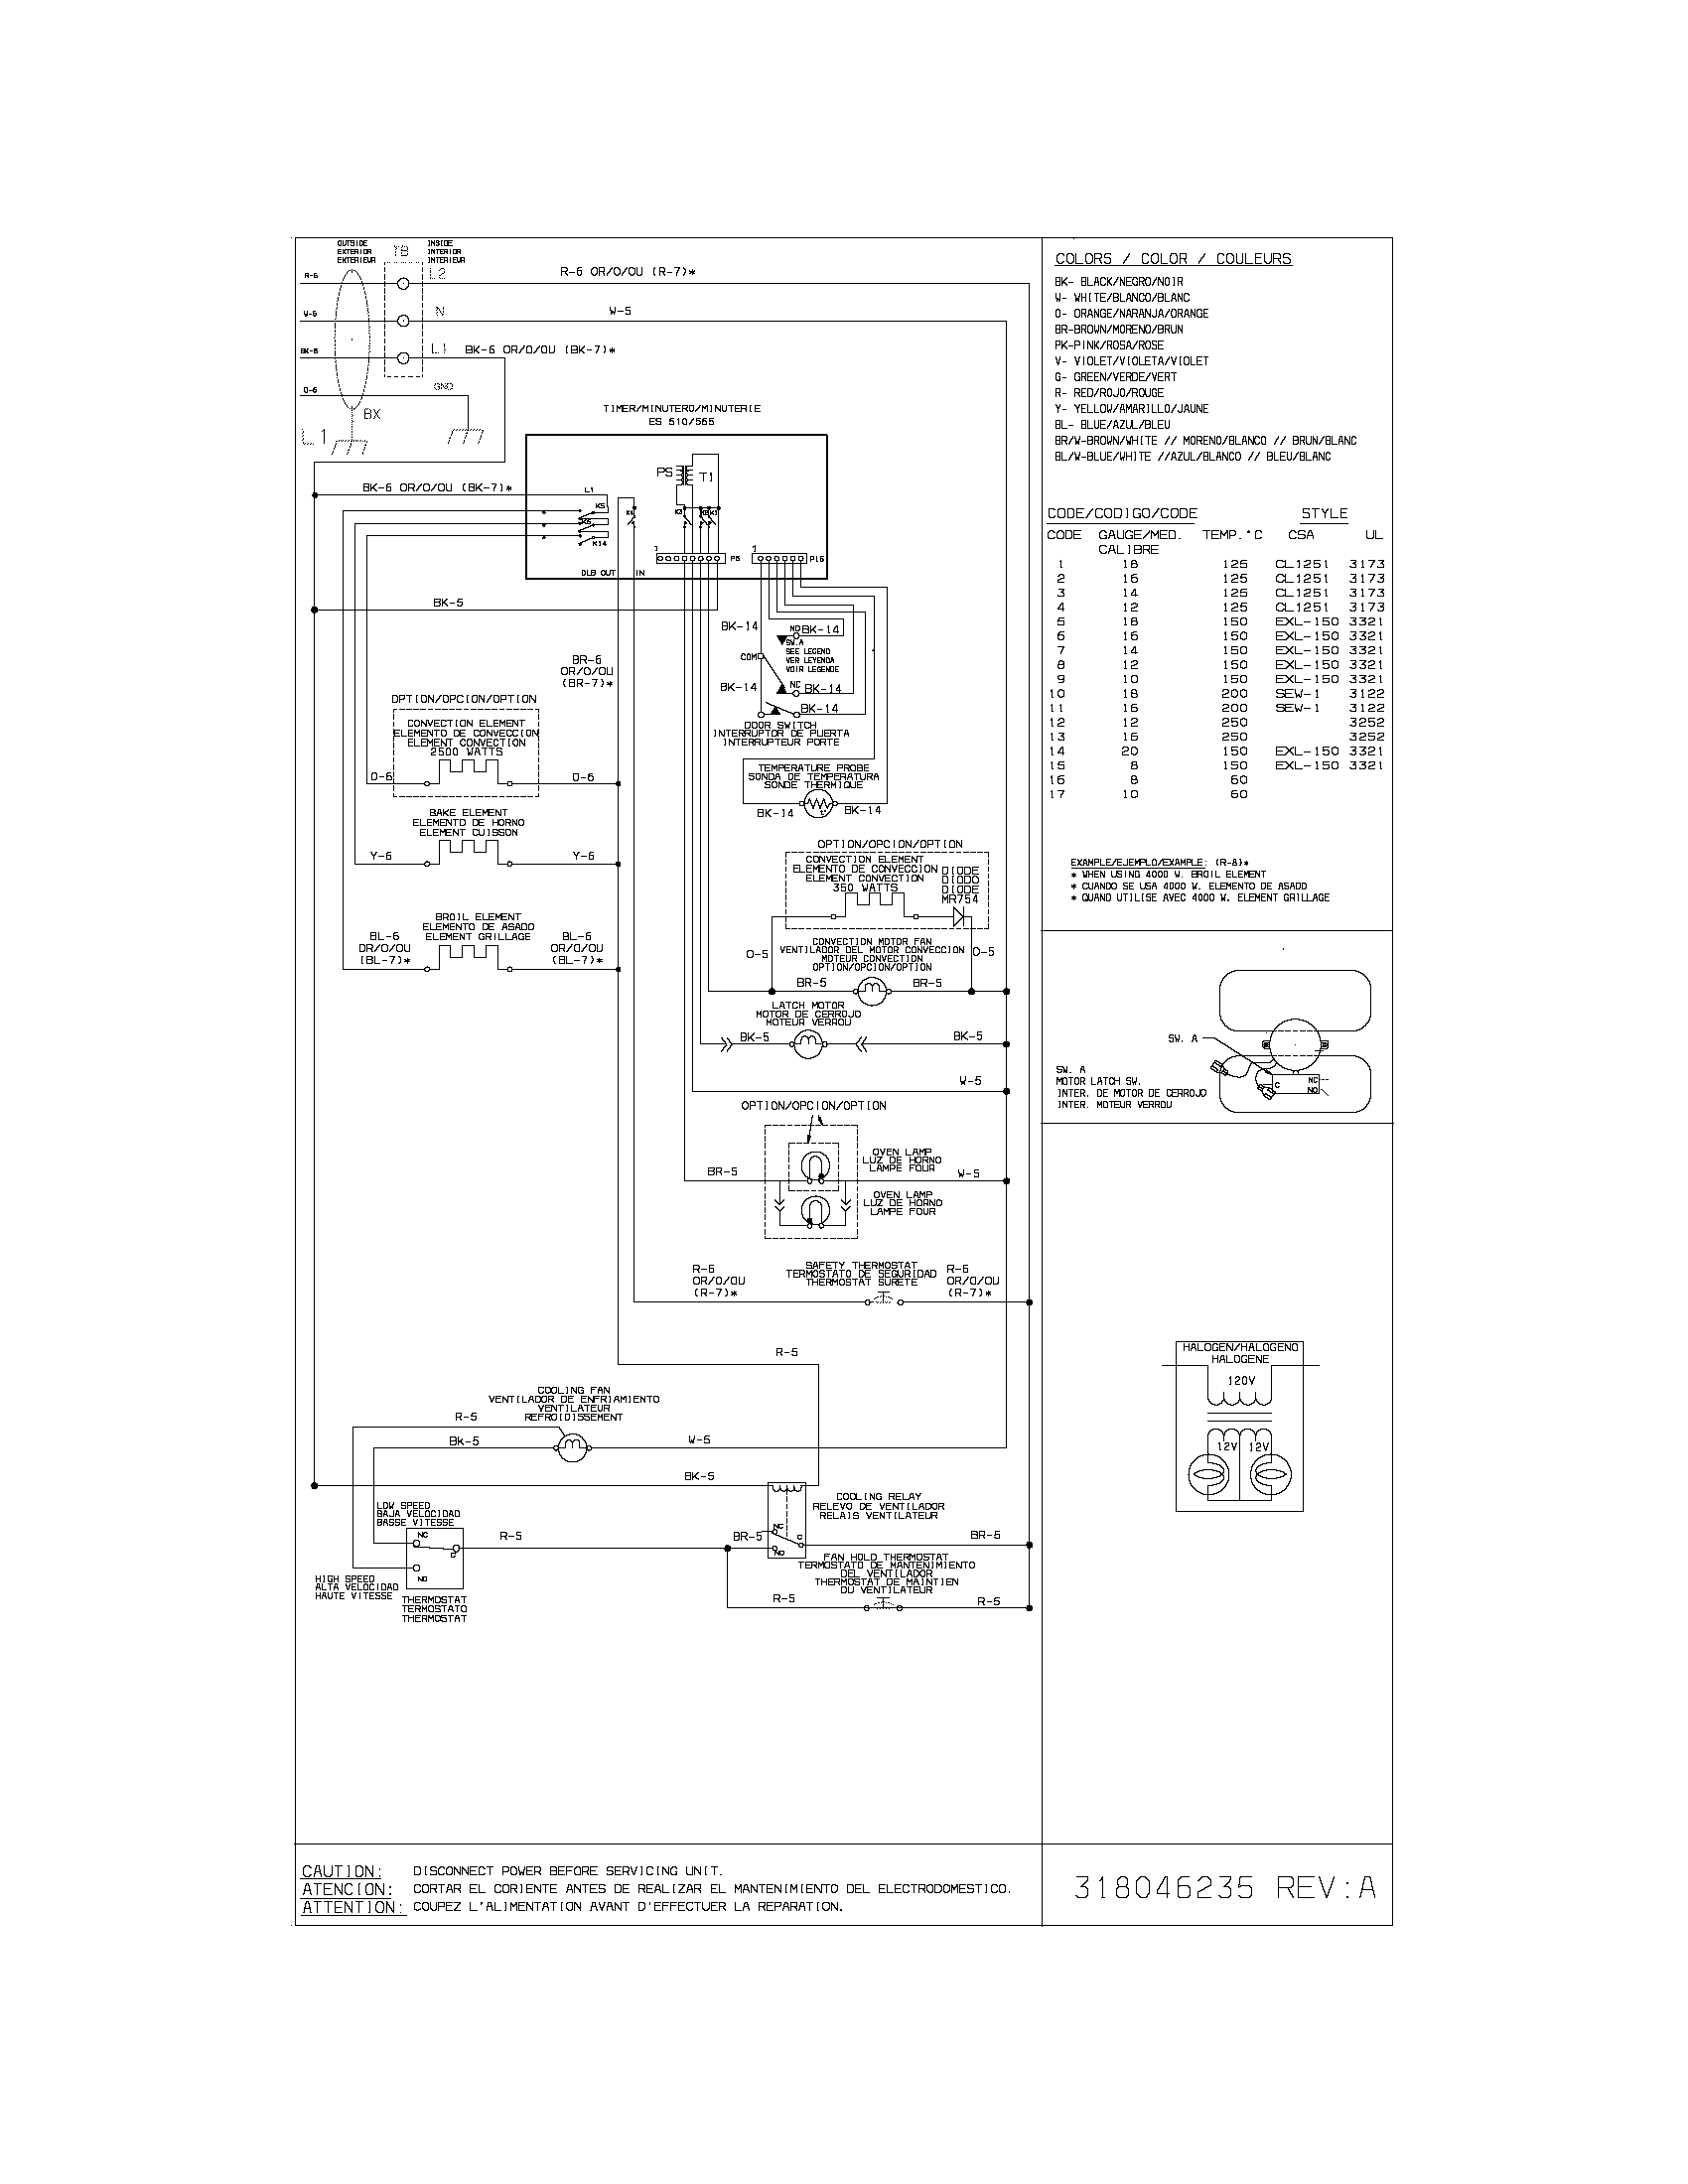 wiring diagram parts?resize=665%2C861&ssl=1 ge monitor top wiring diagram ge dishwasher diagram, ge repair ge stove wiring diagram at gsmx.co